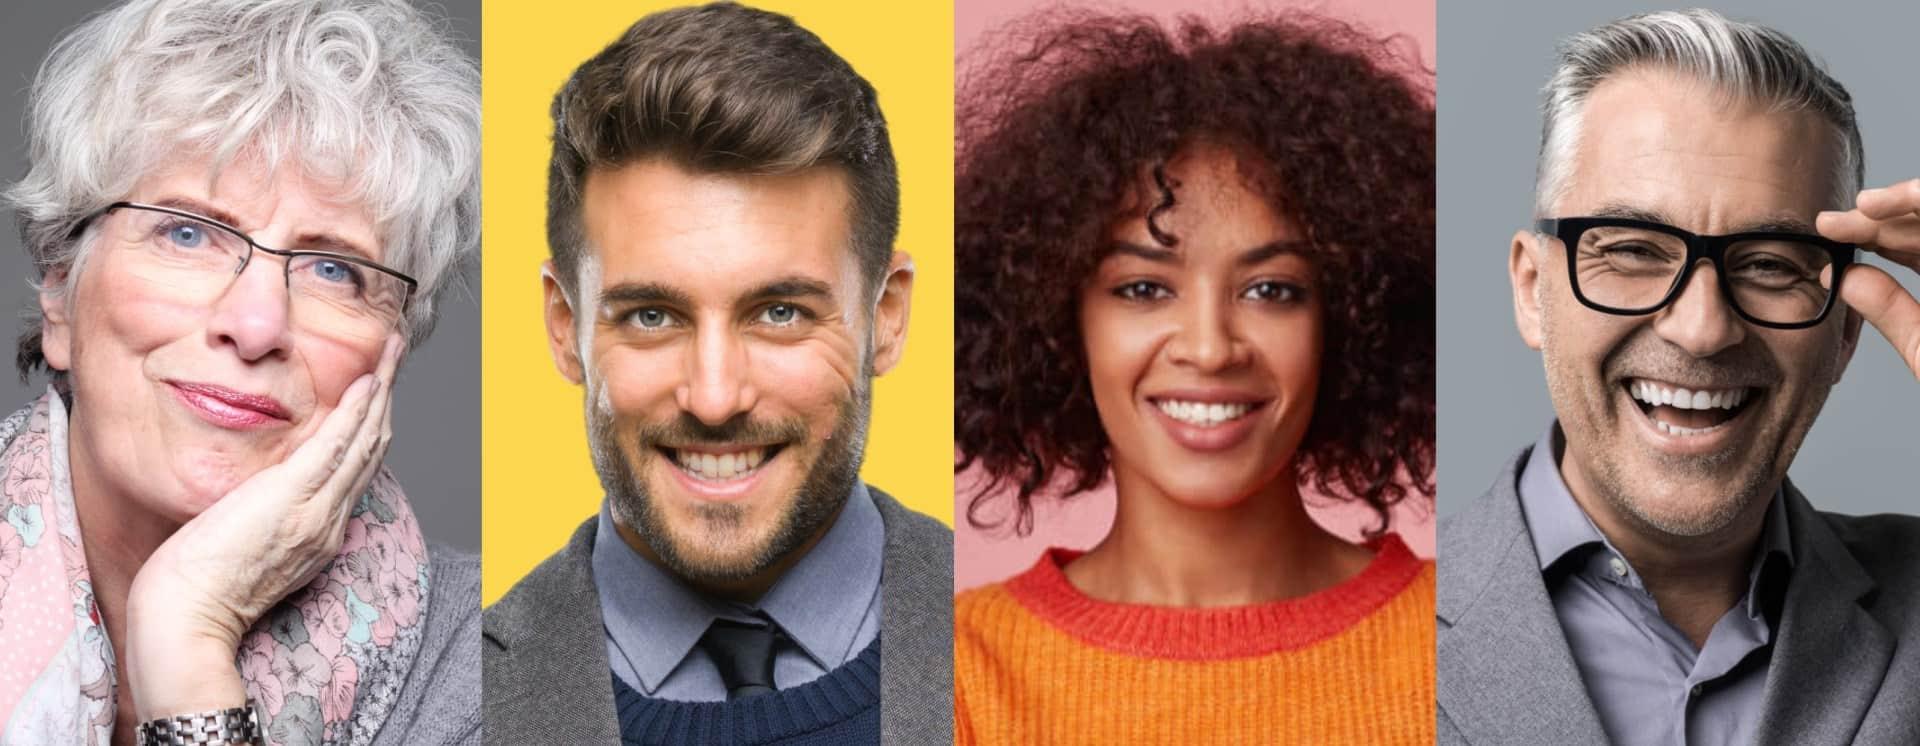 Analyse morpho-visage et conseils coiffure